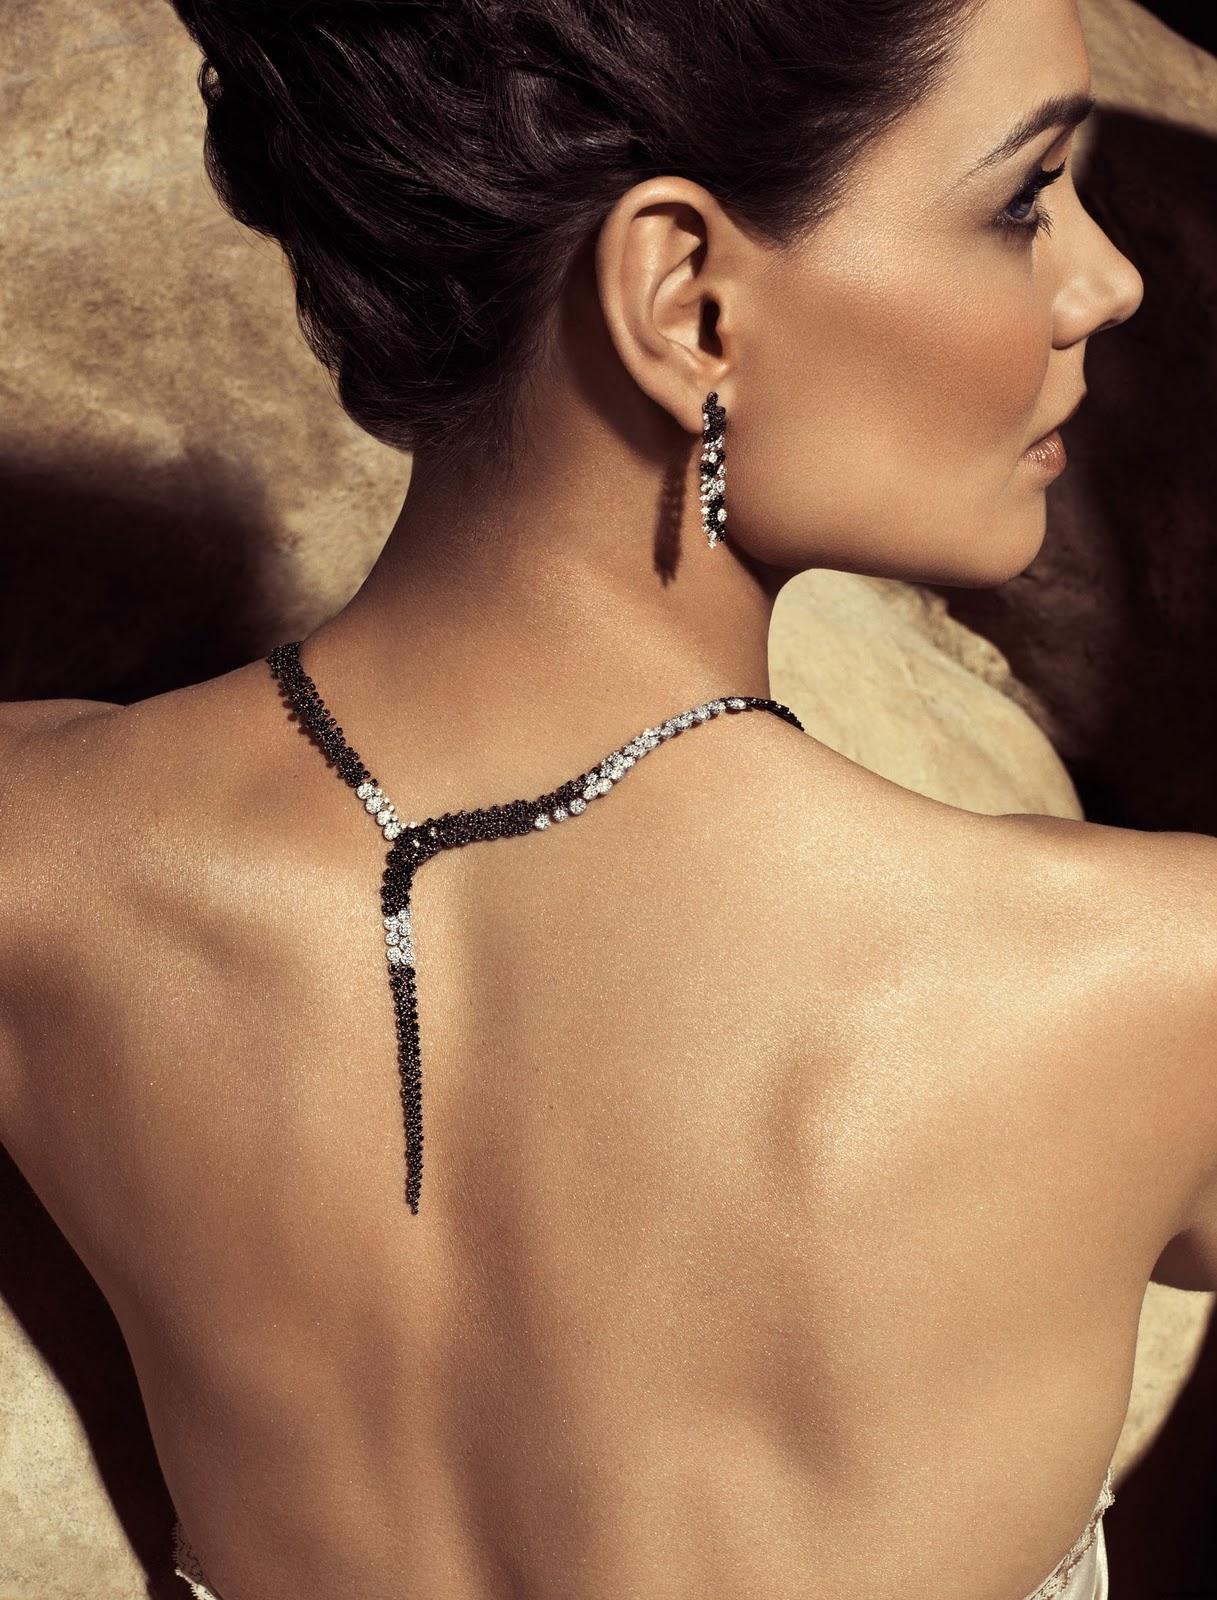 http://2.bp.blogspot.com/-FI8ZvR-EgOU/Tx1gZpbm2cI/AAAAAAAAArY/8kQ7-wueXGM/s1600/Katie-Holmes-Jewelry-H.-Stern.jpg